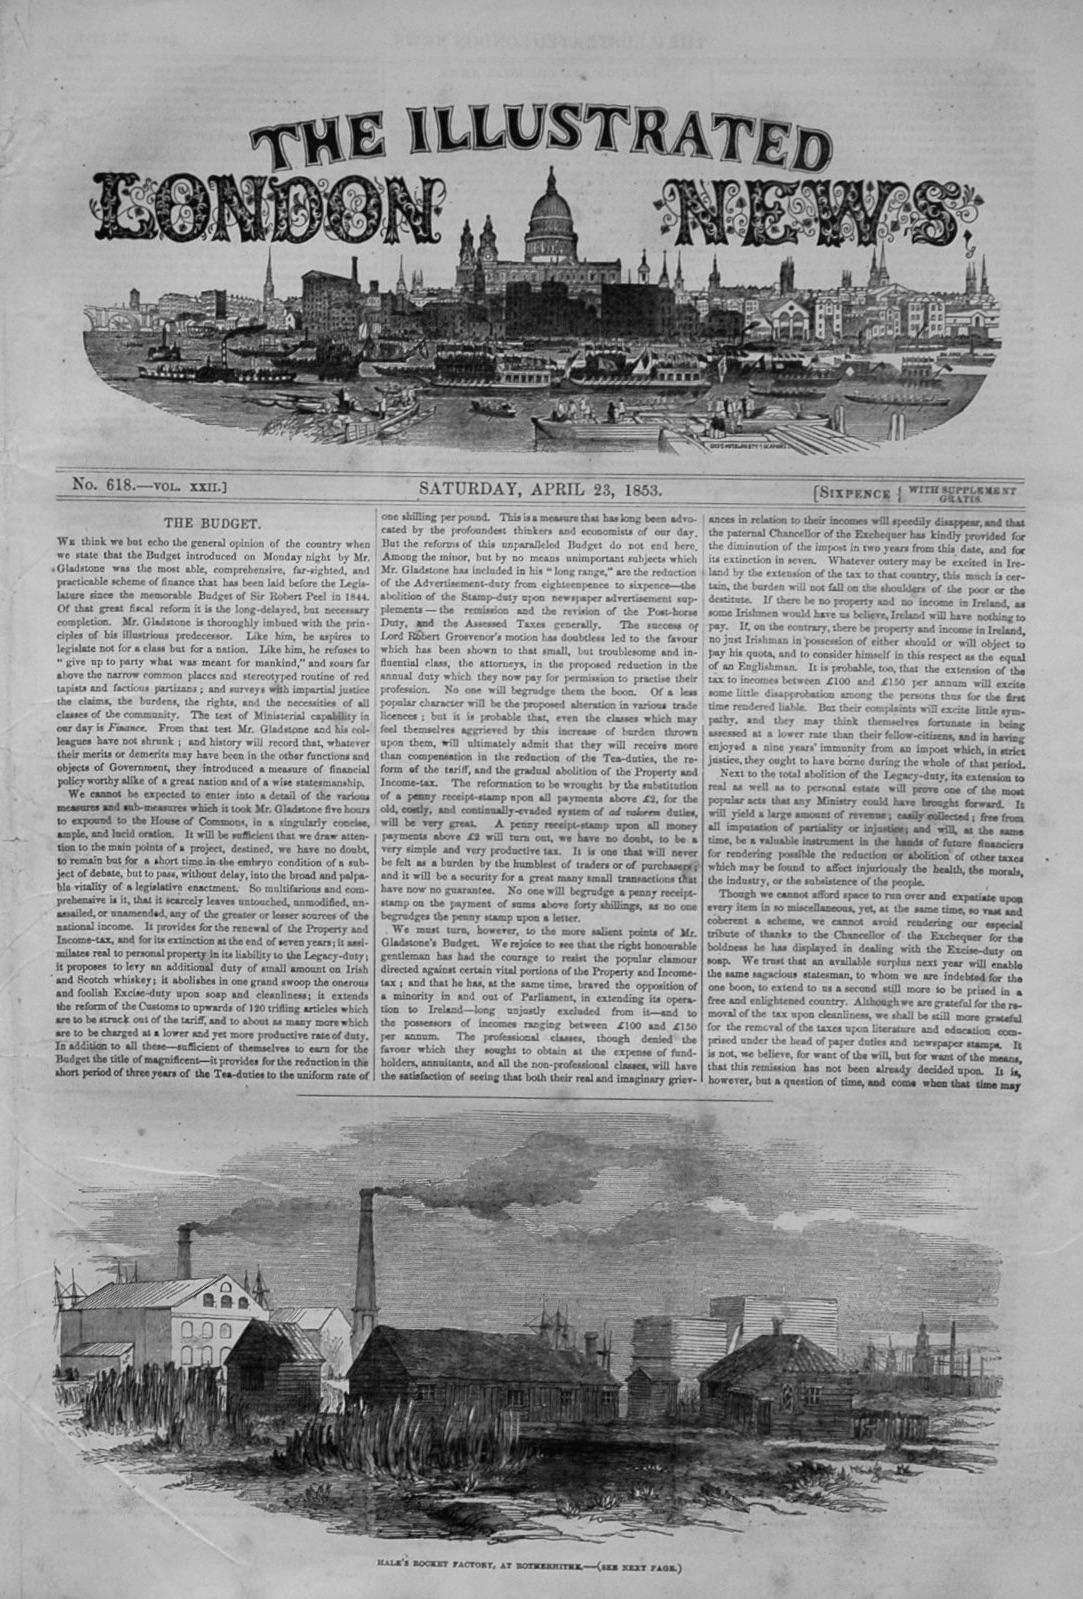 Illustrated London News  April 23rd, 1853.